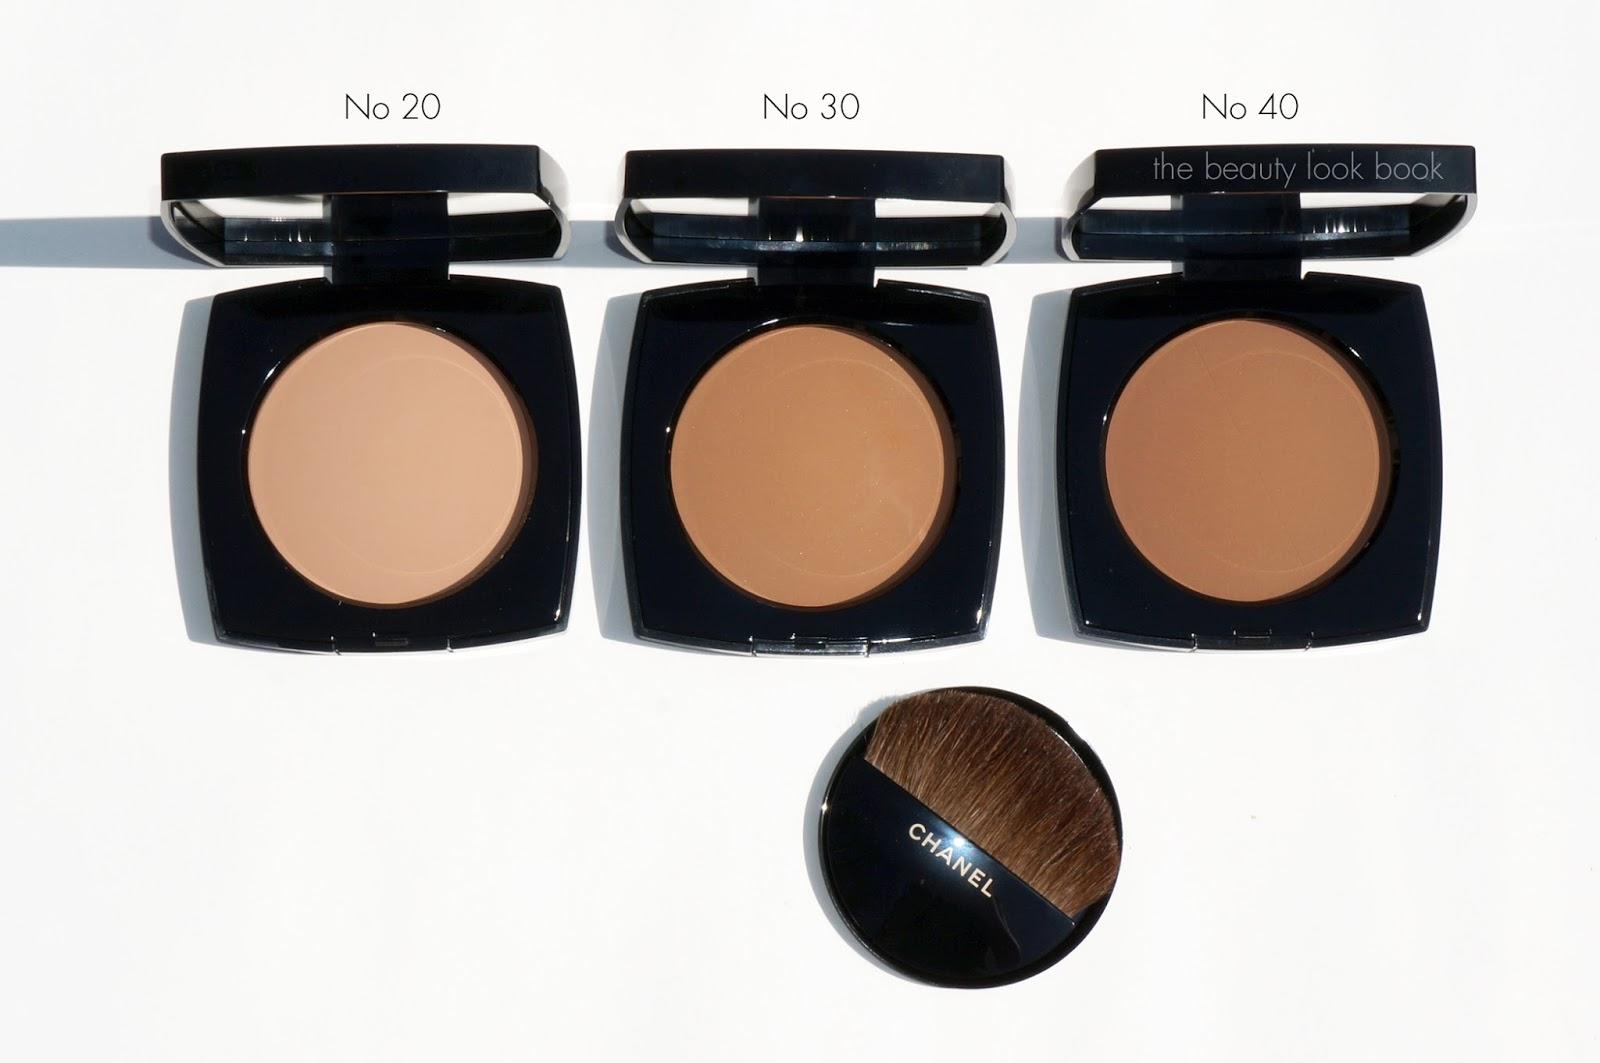 chanel les beiges comparisons the beauty look book. Black Bedroom Furniture Sets. Home Design Ideas